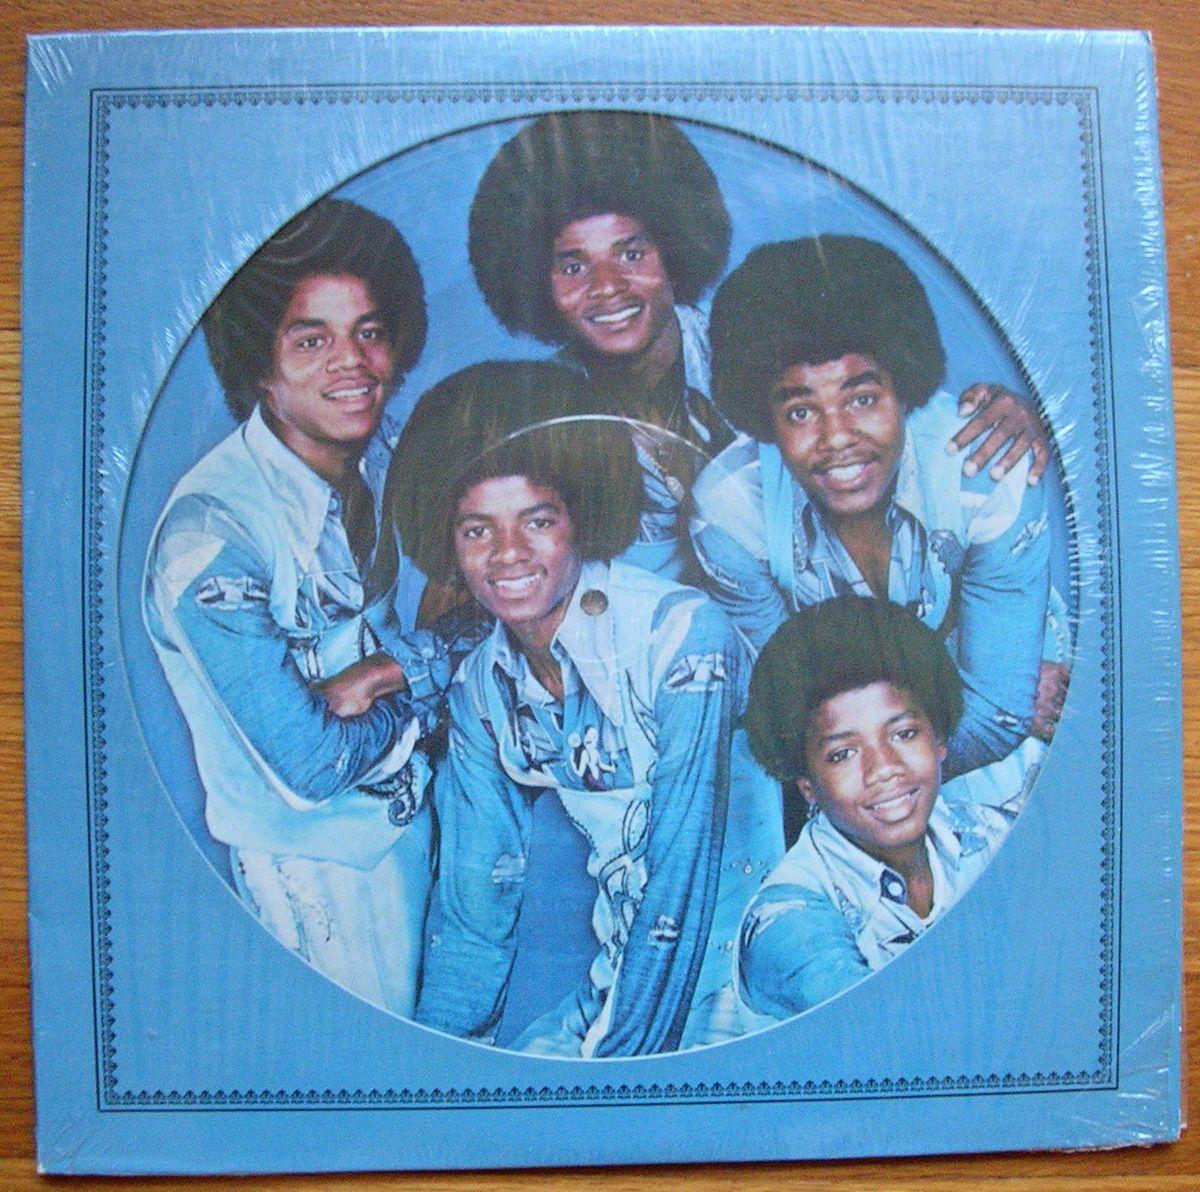 Michael Jackson Record Album LP The Jacksons Picture Disc RARE EXC